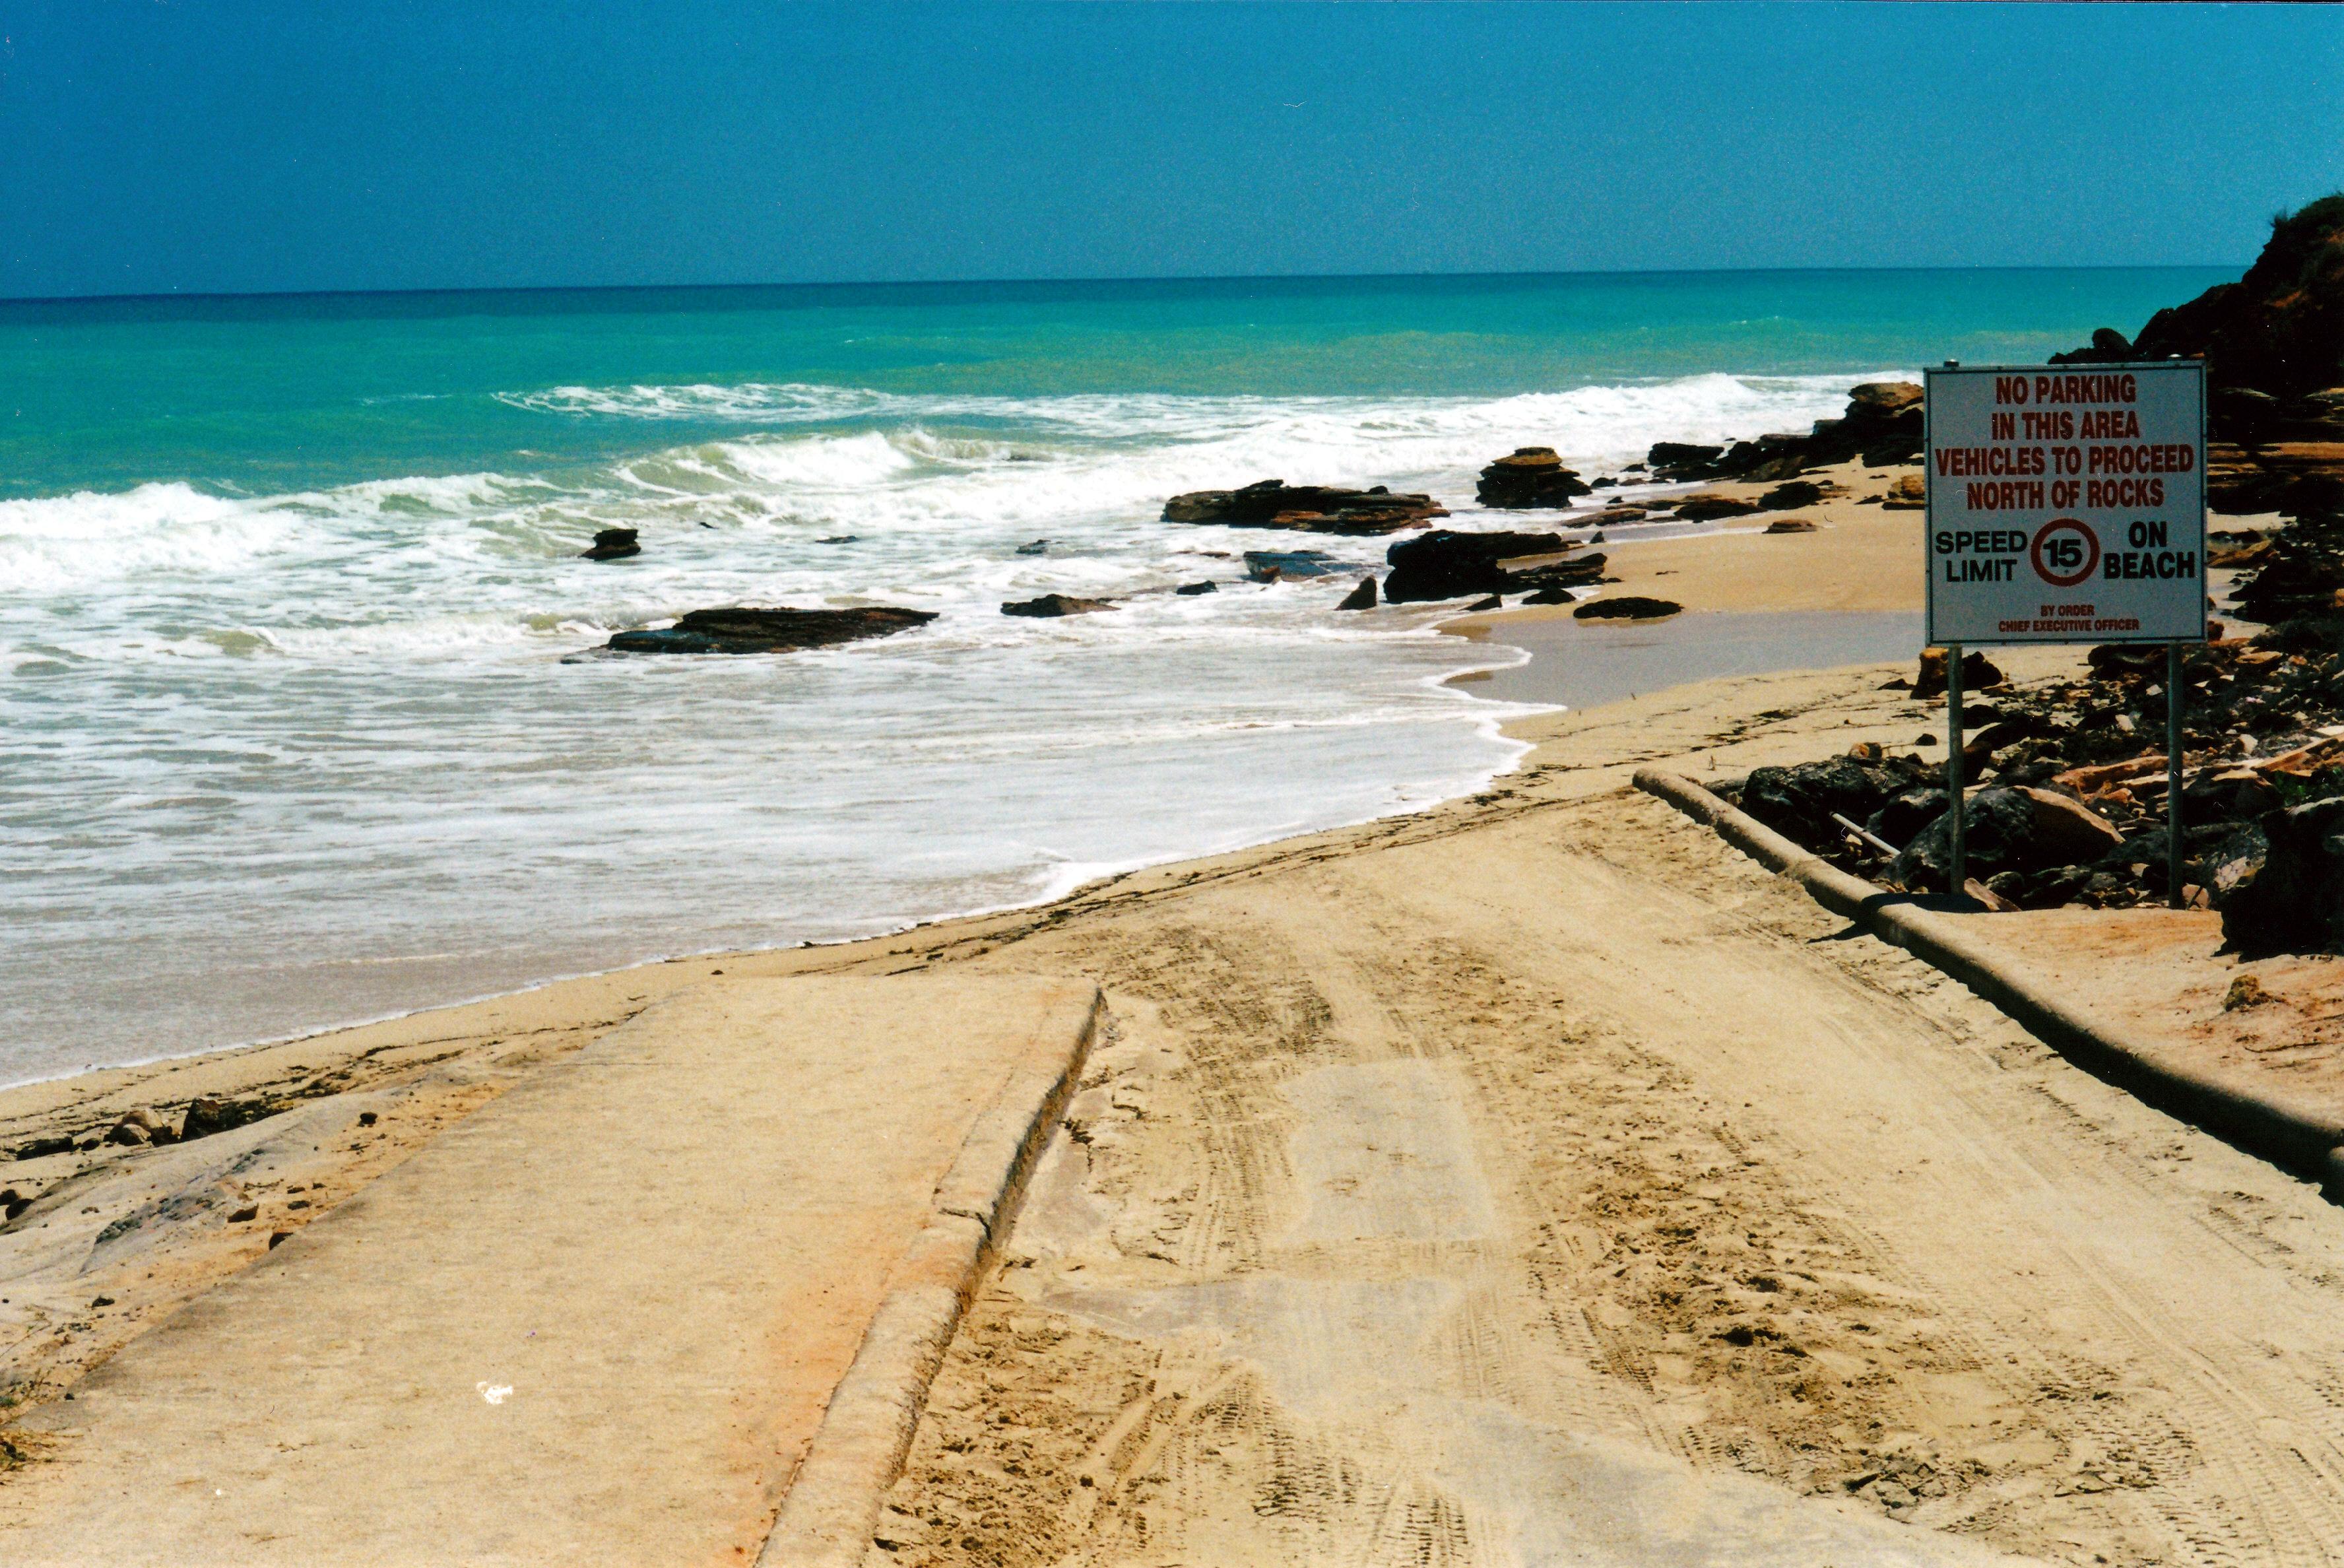 08-30-2000 cable beach high tide.jpg